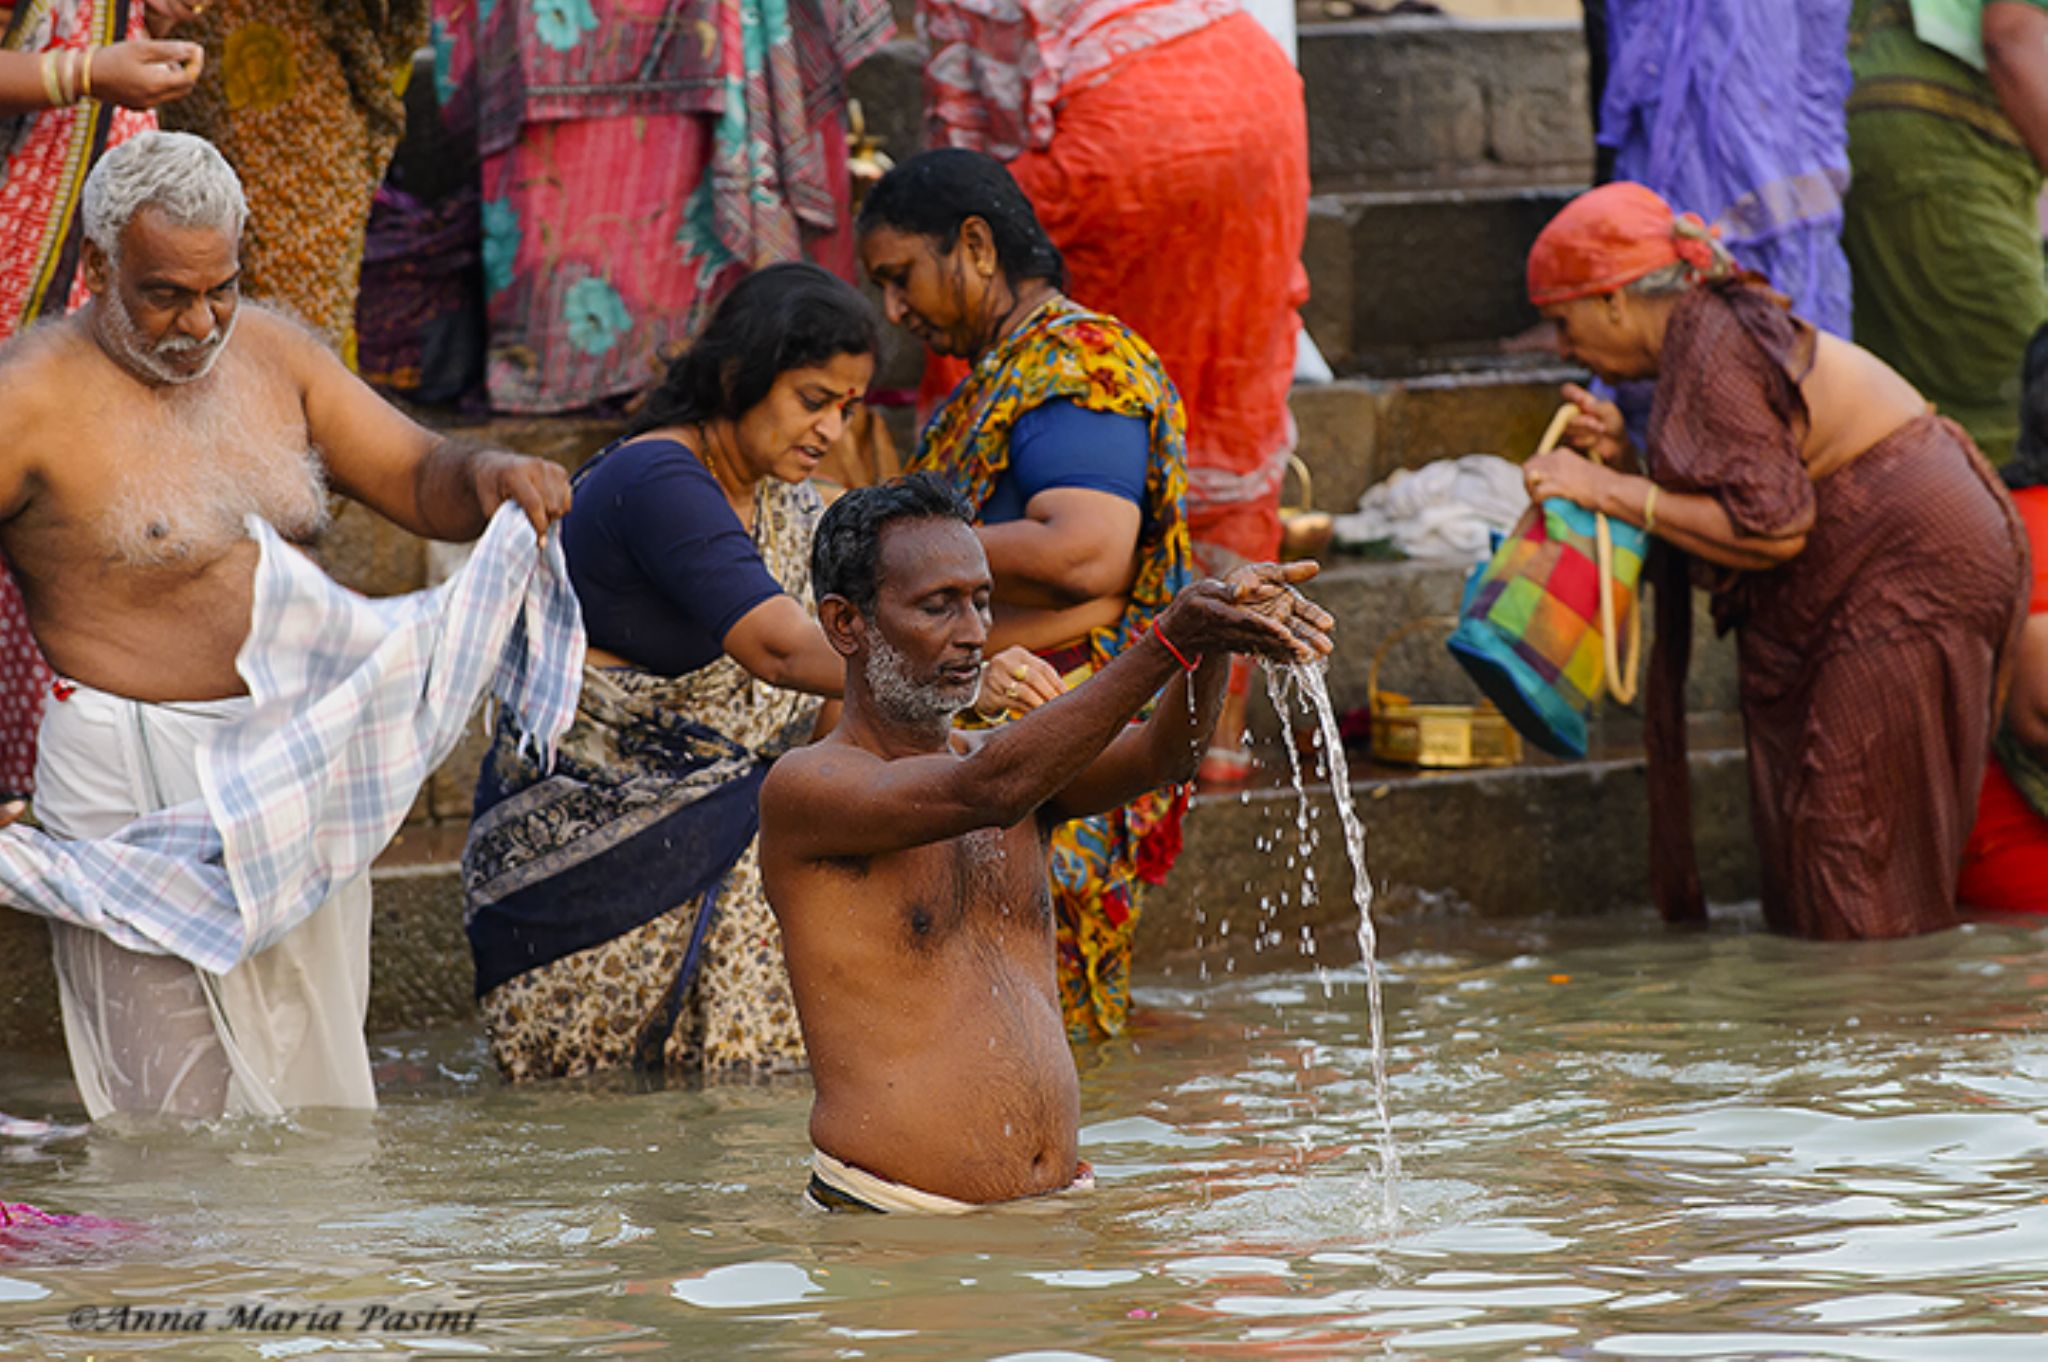 Preghiera sul Gange a Varanasi by annamariapasini